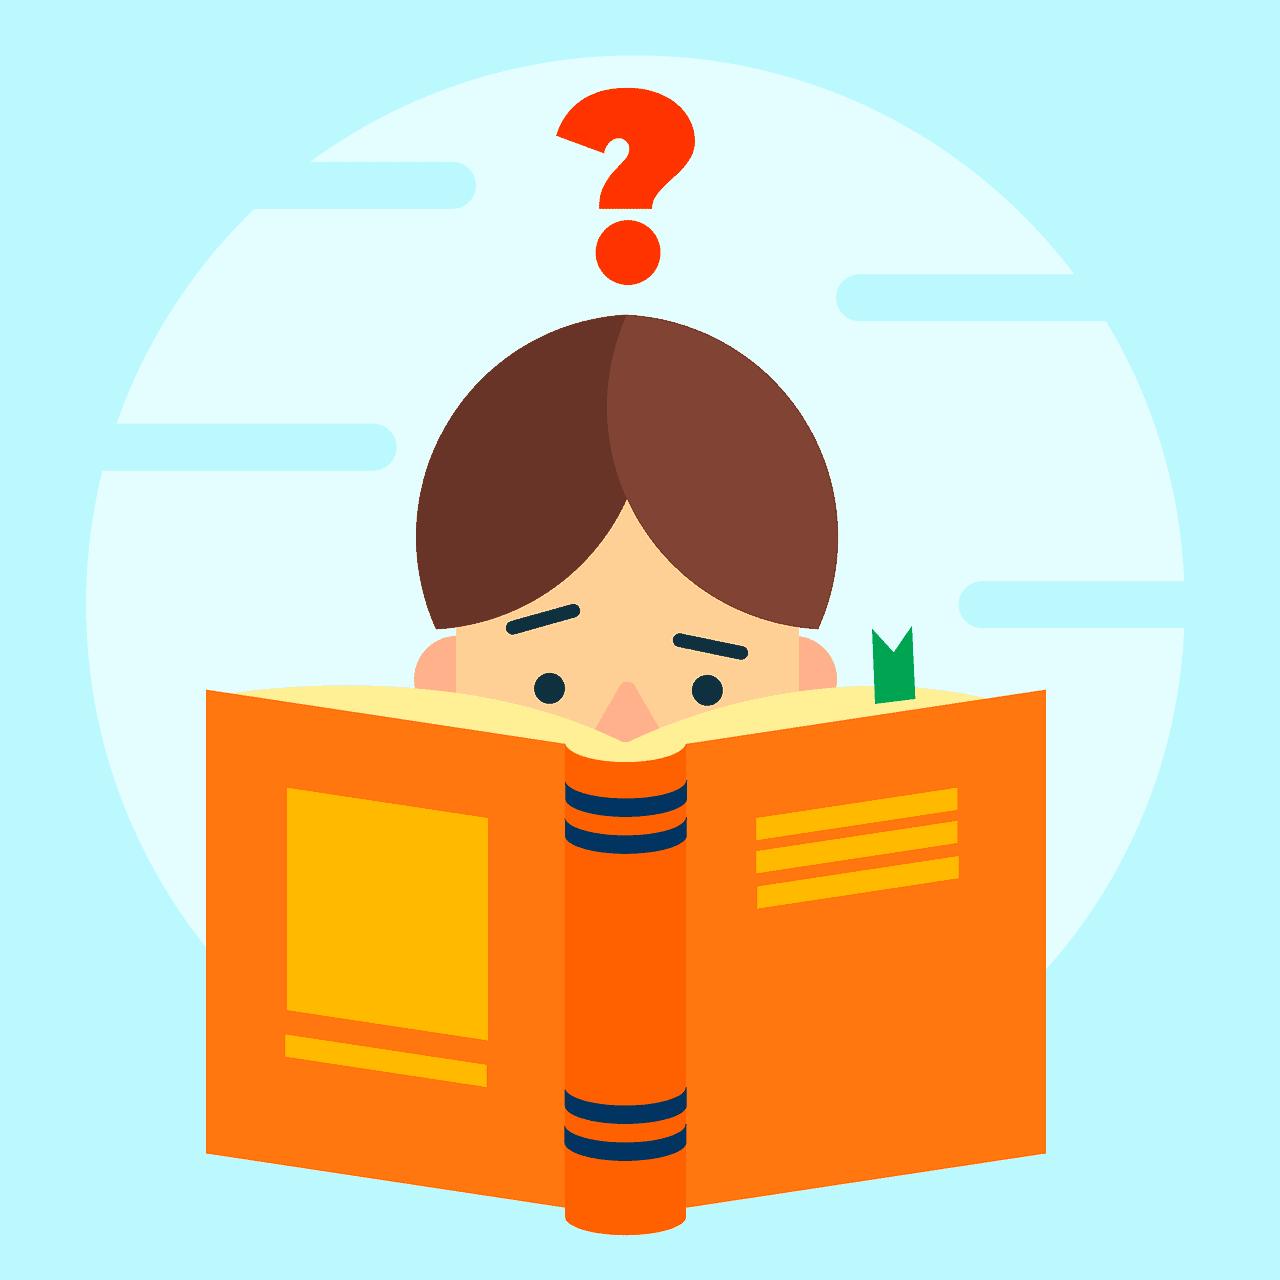 livre-apprentissage-lecture